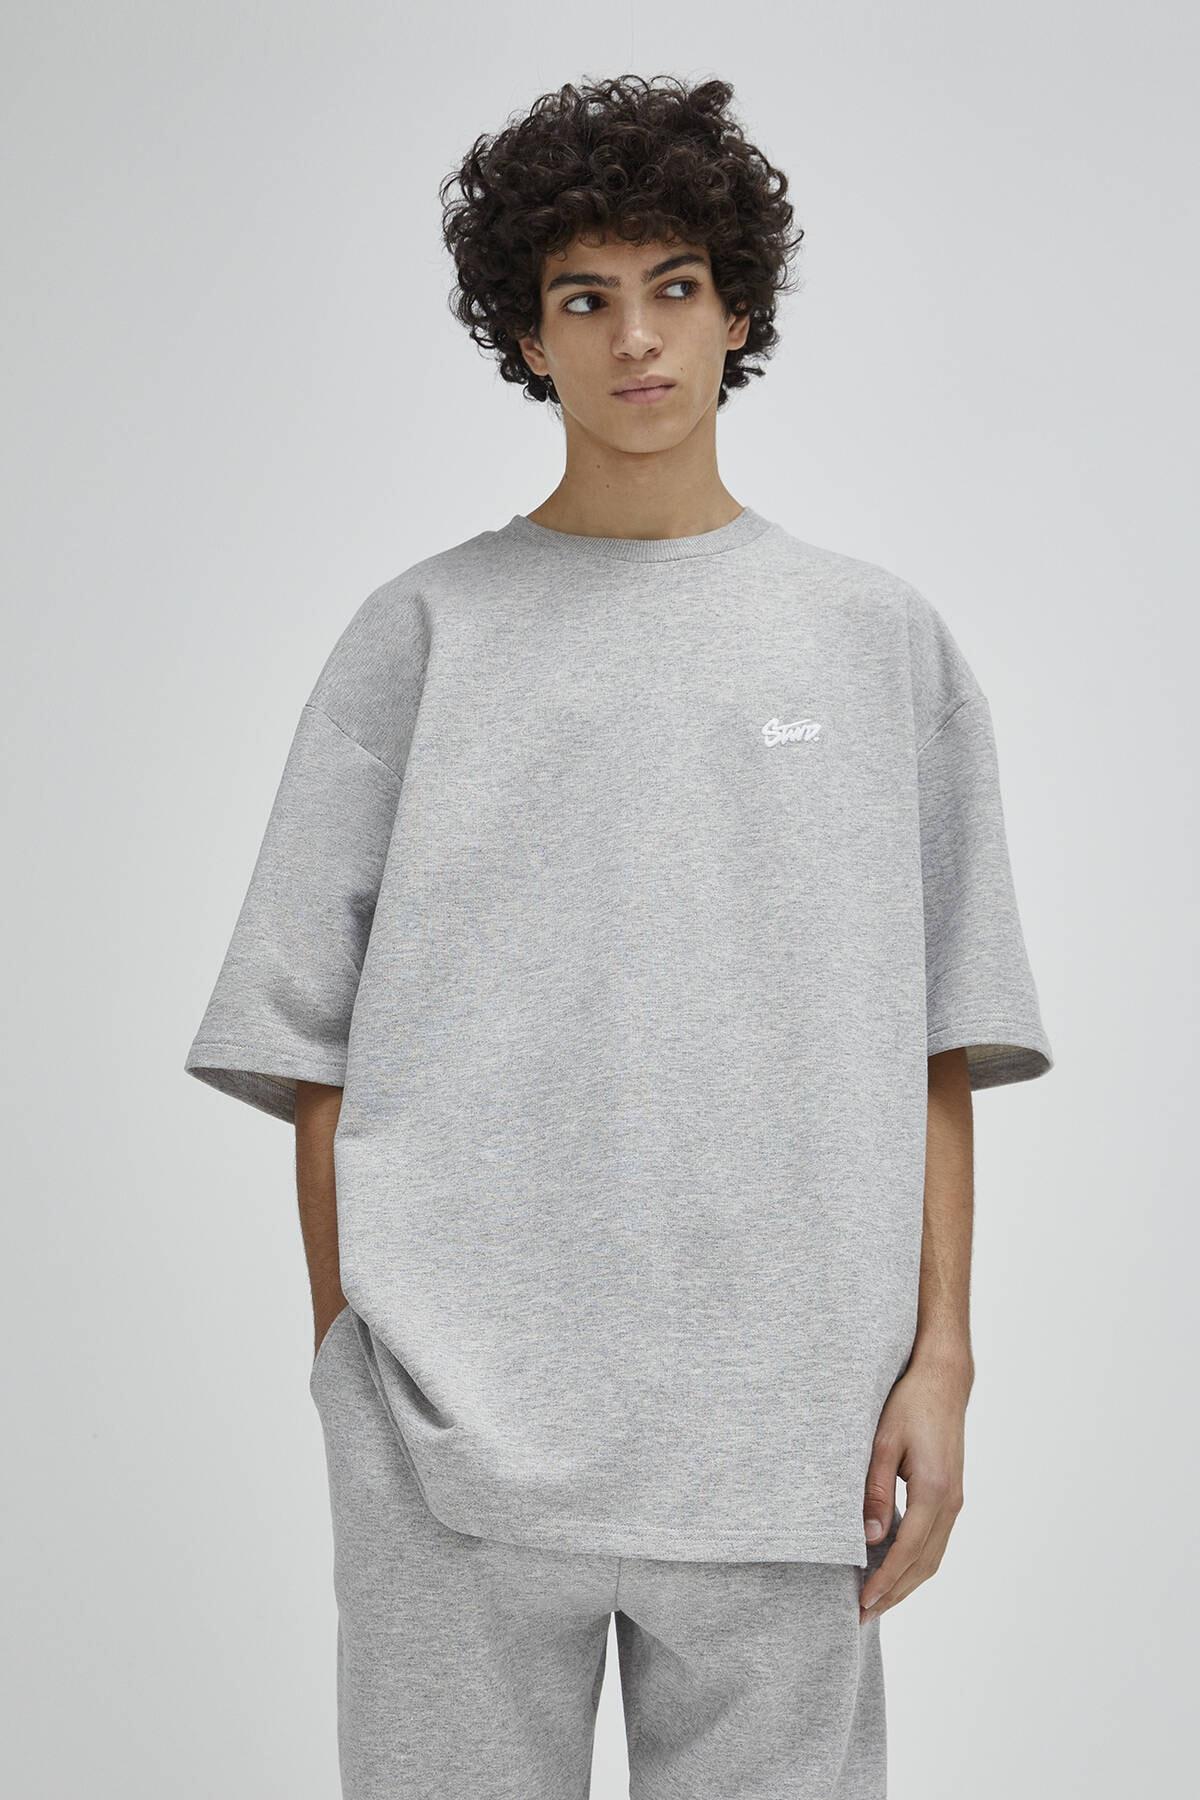 Pull & Bear Erkek Açık Gri Homewear Kapsül Koleksiyonu T-Shirt 04240542